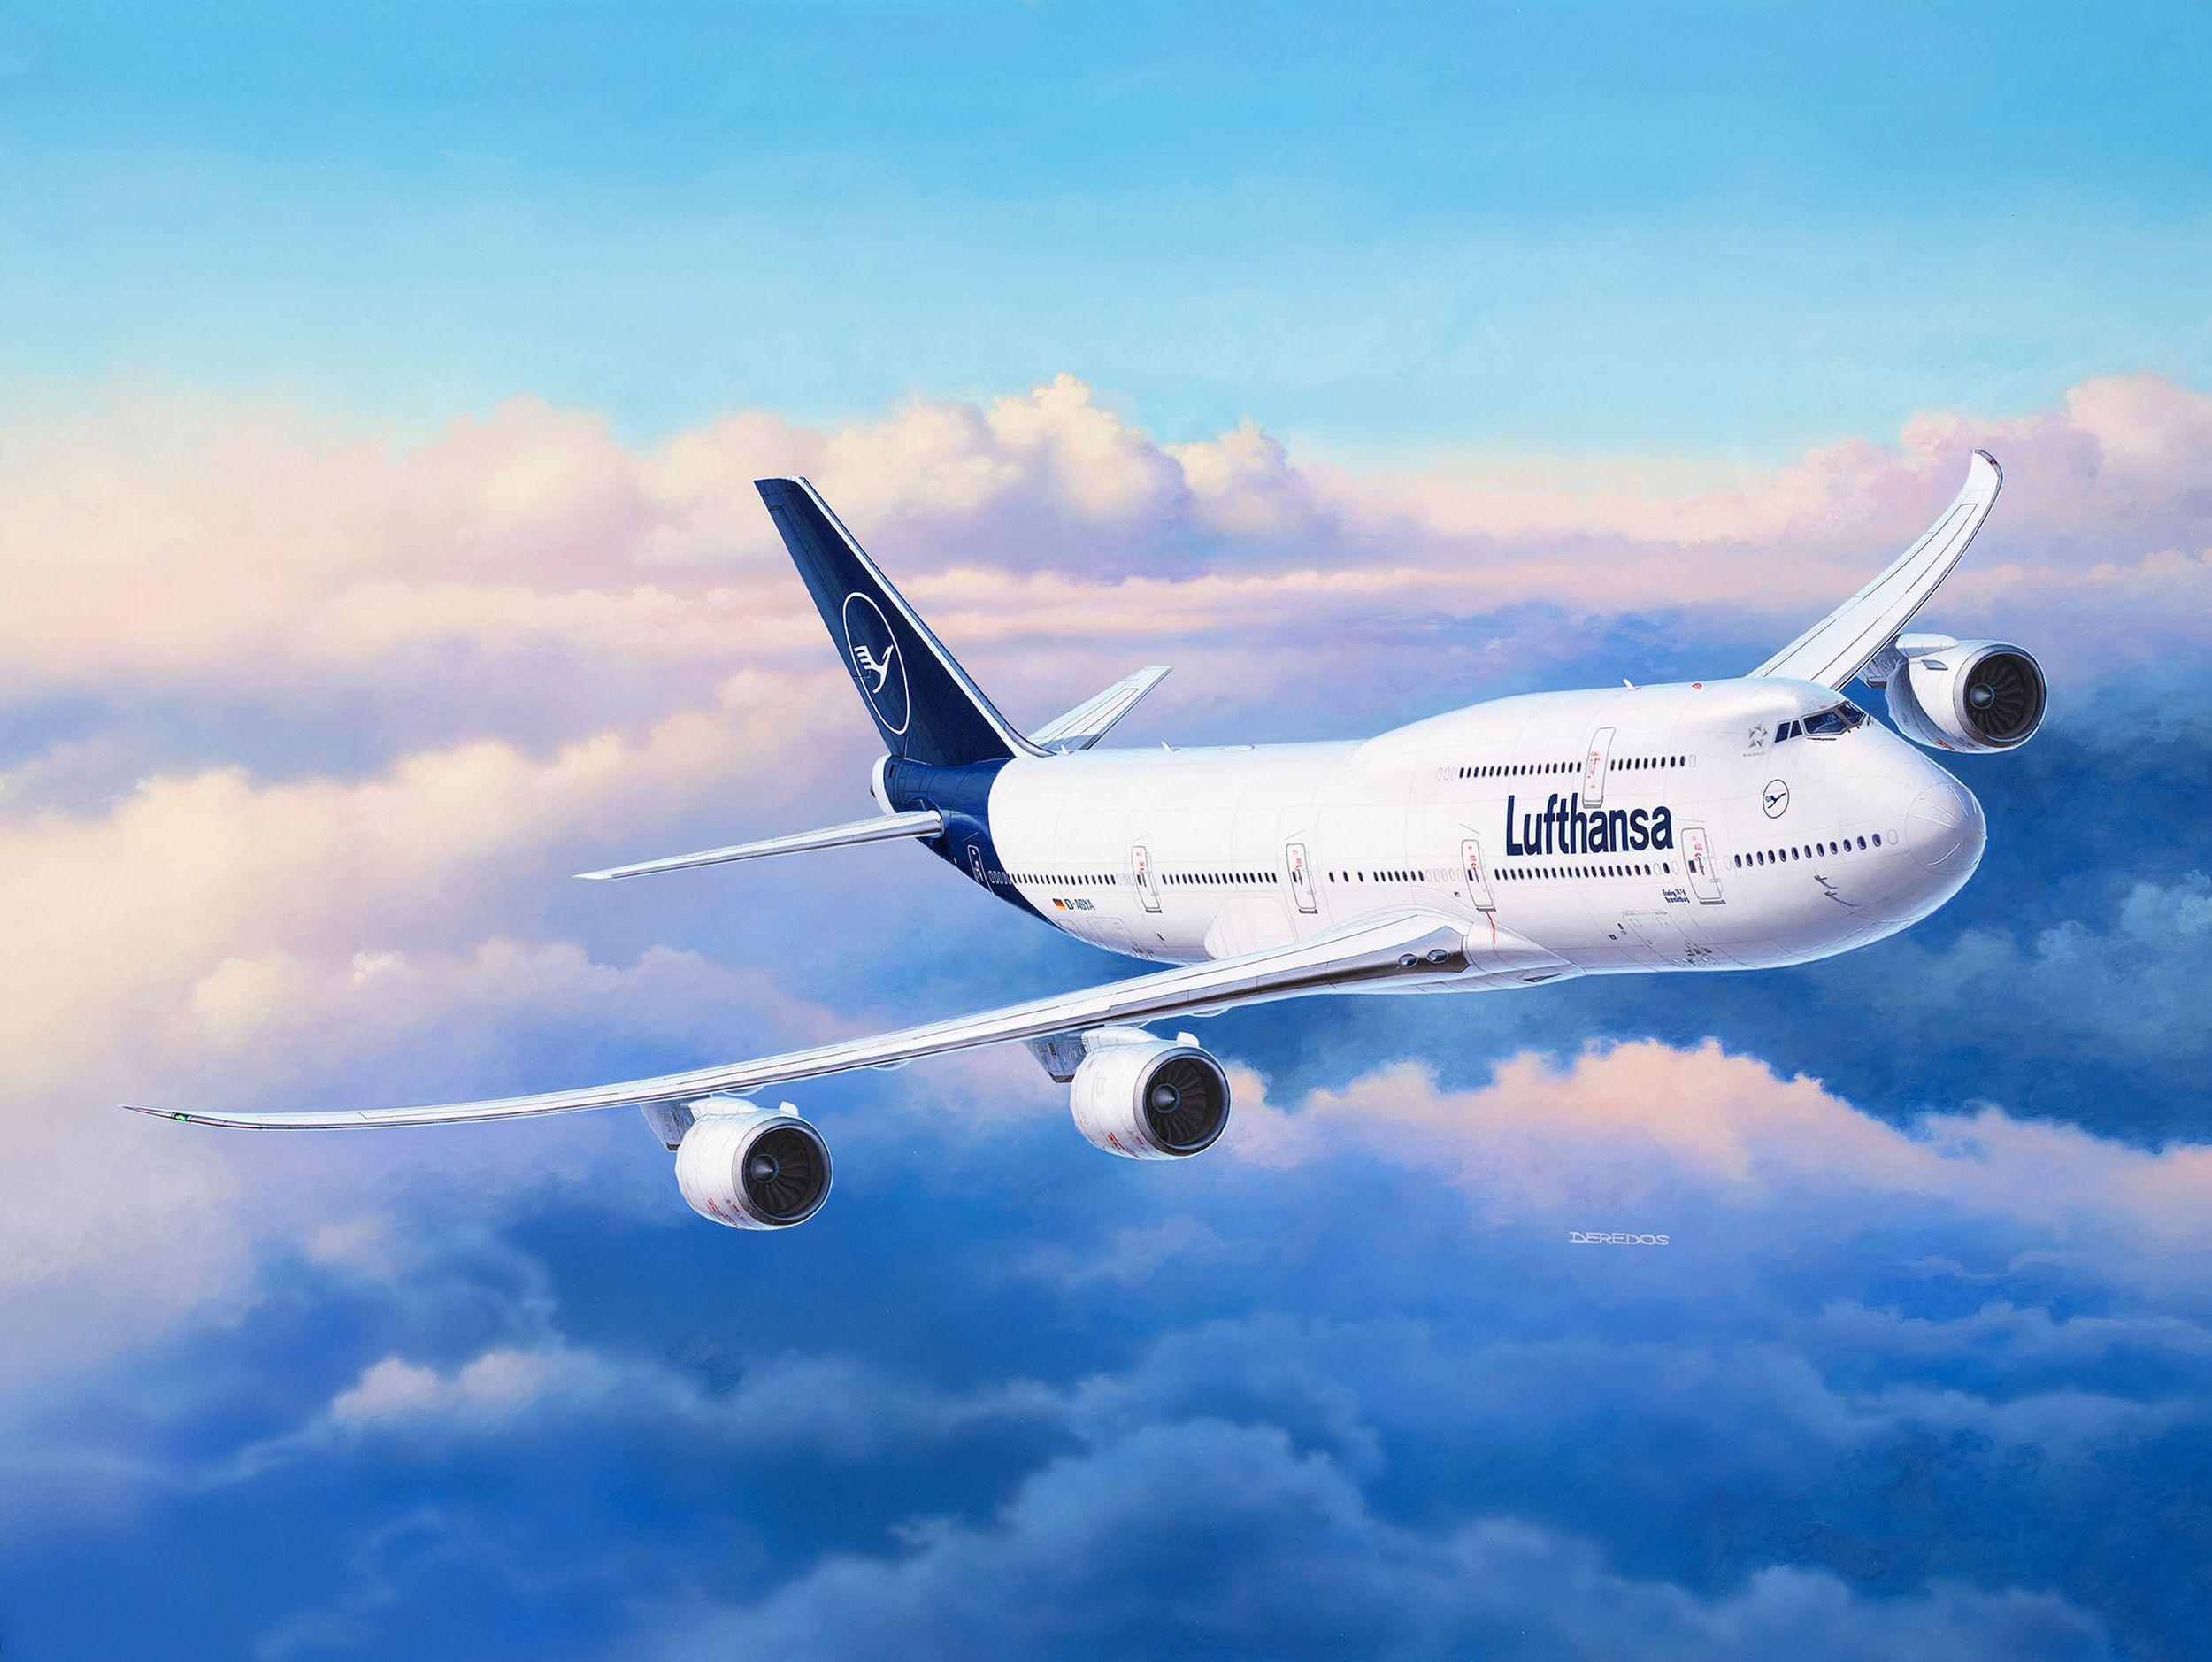 Revell-03891-Boeing-747-8-Lufthansa-New-Livery Revell-Neuheiten im I. Quartal 2019